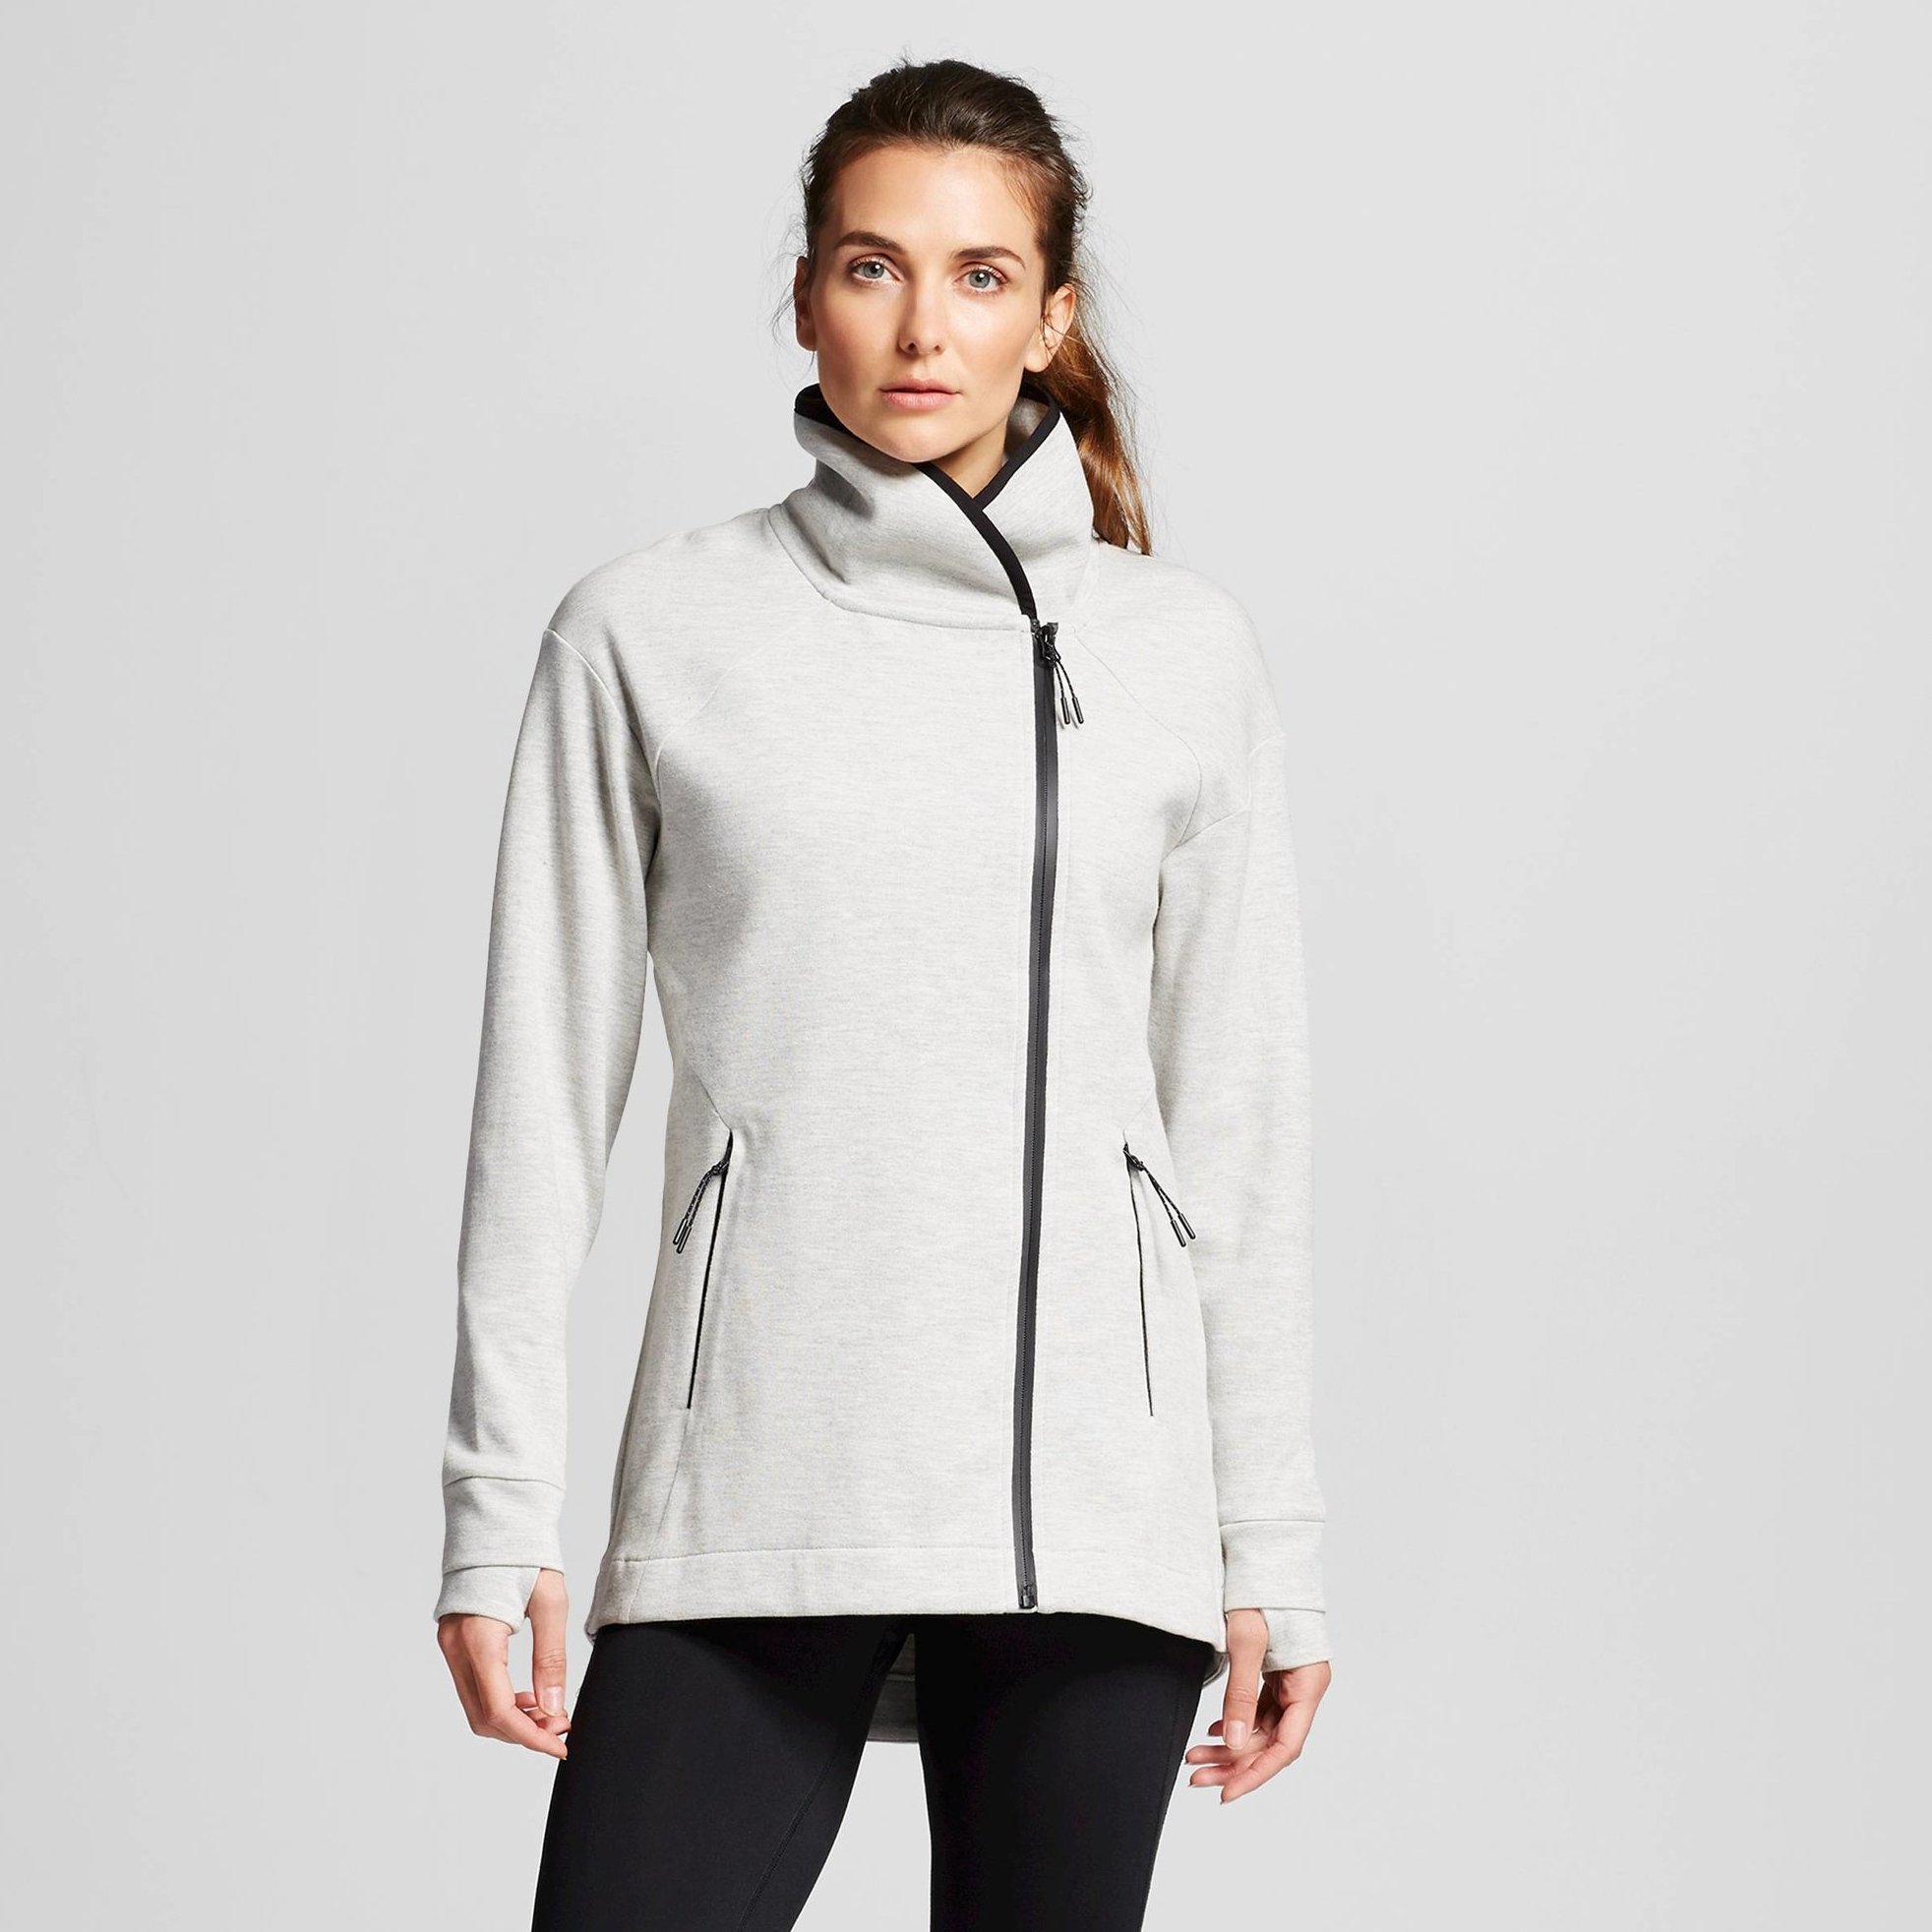 Victory Fleece Jacket from Target